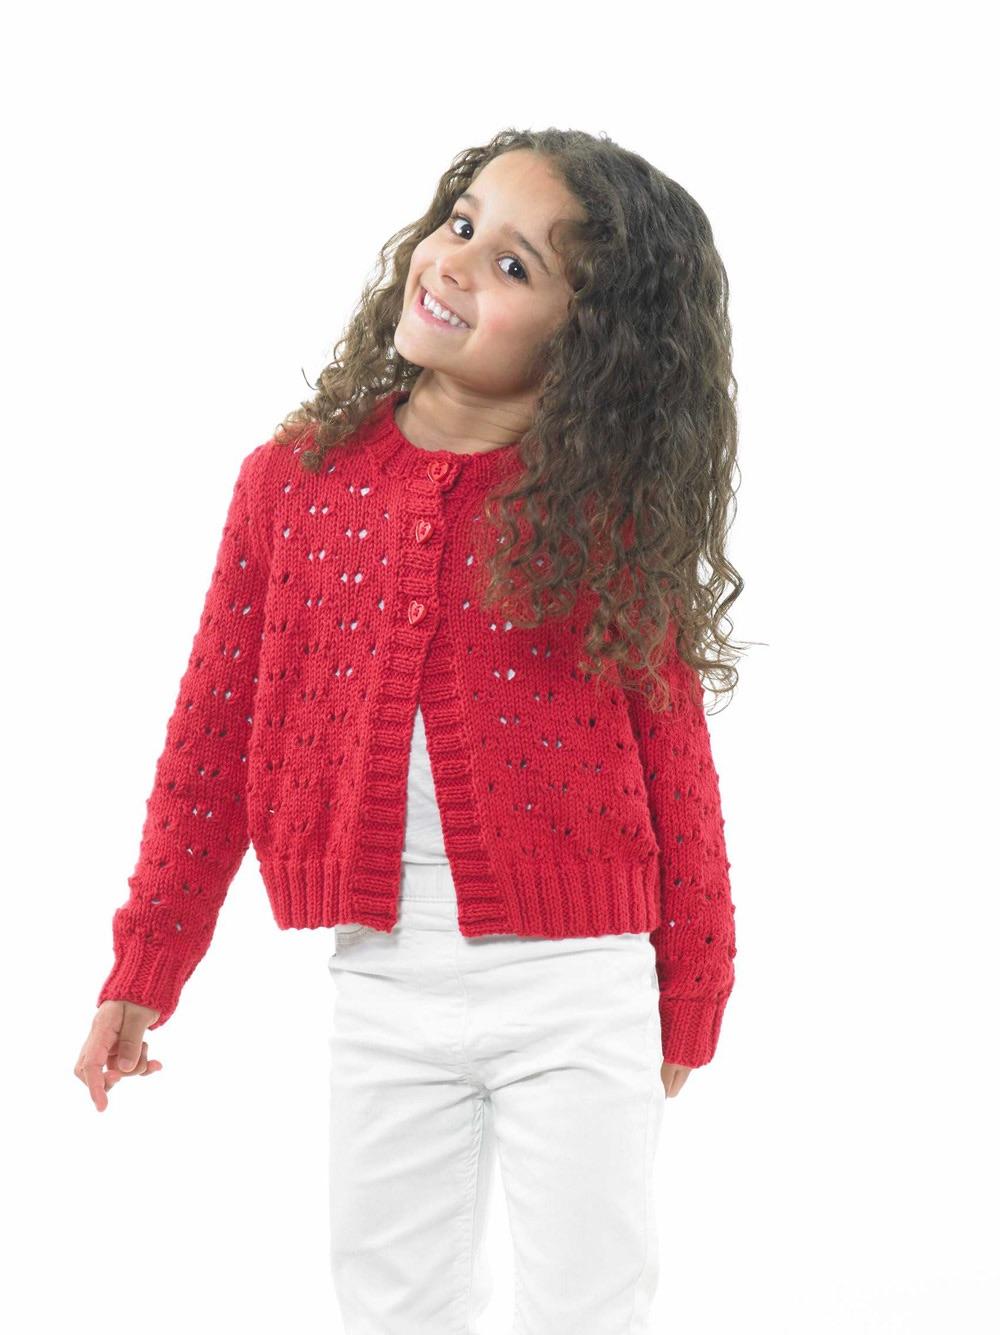 Childrens Knitting Pattern Cardigan JB675